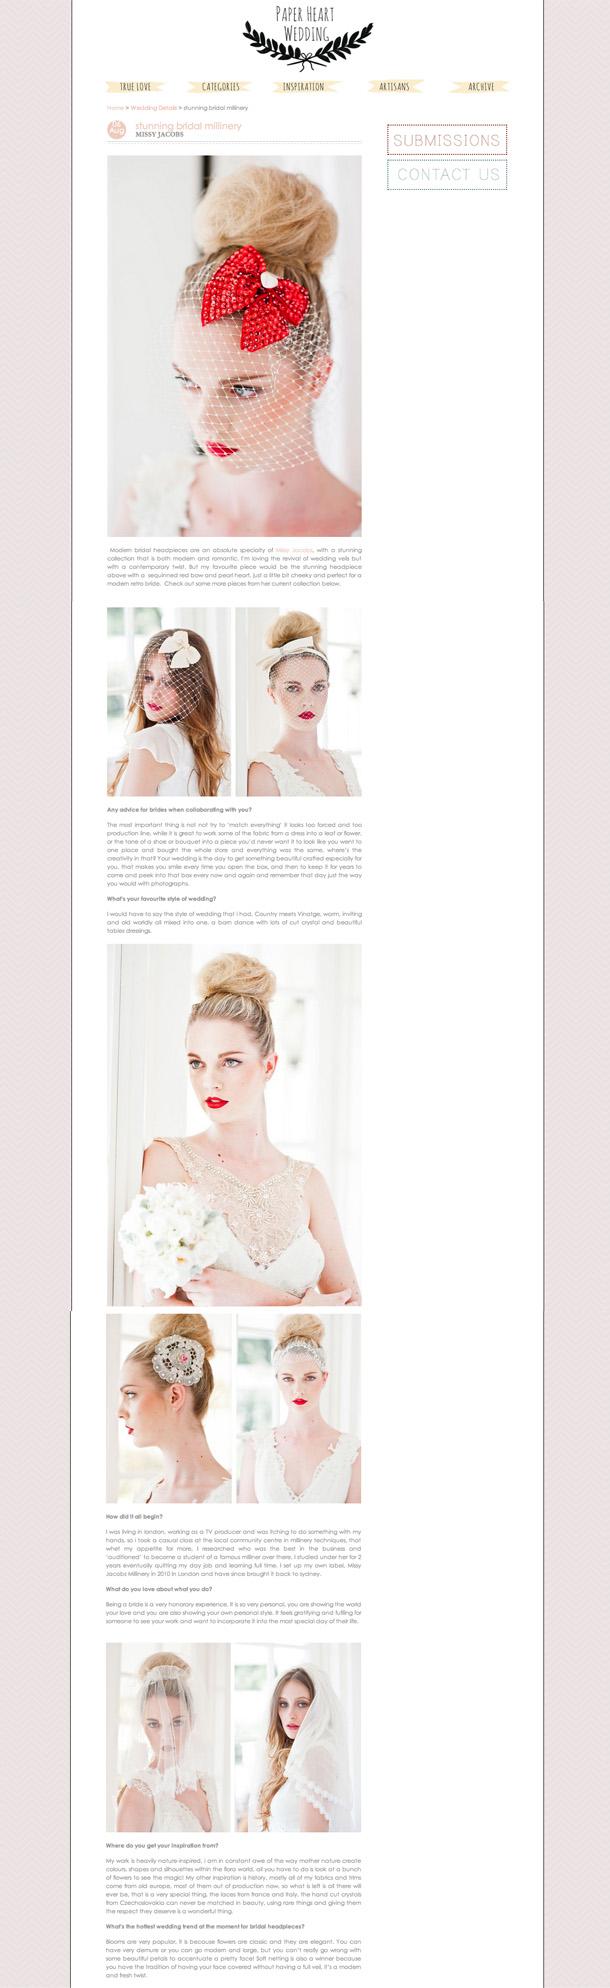 Stunning Bridal Millinery Missy Jacobs.jpg